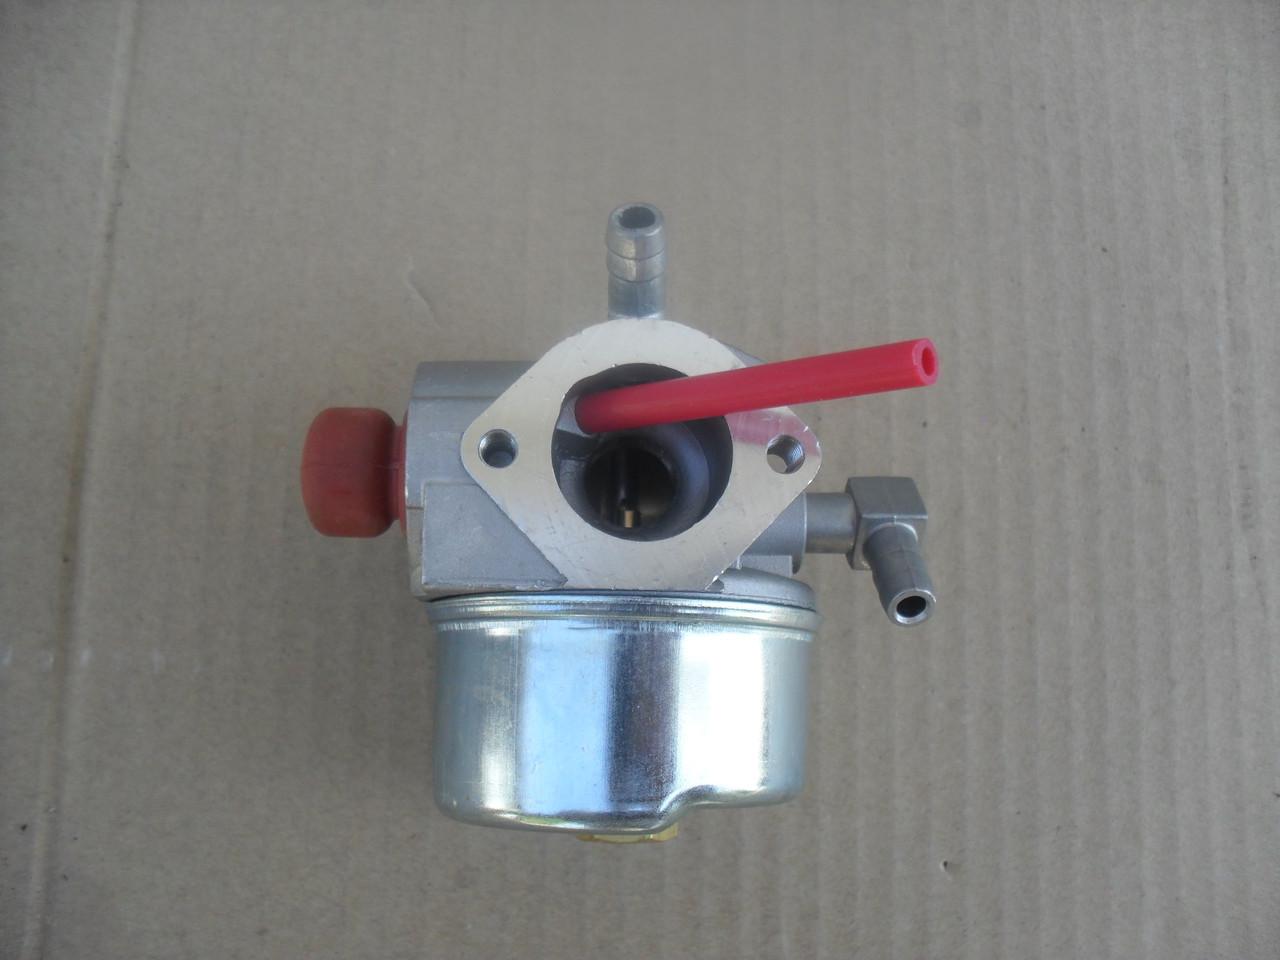 Carburetor for Tecumseh LEV100, LEV115, LEV120, 640173, 640174, 640262, 640262A, 640124, 640156, 640168, 640119